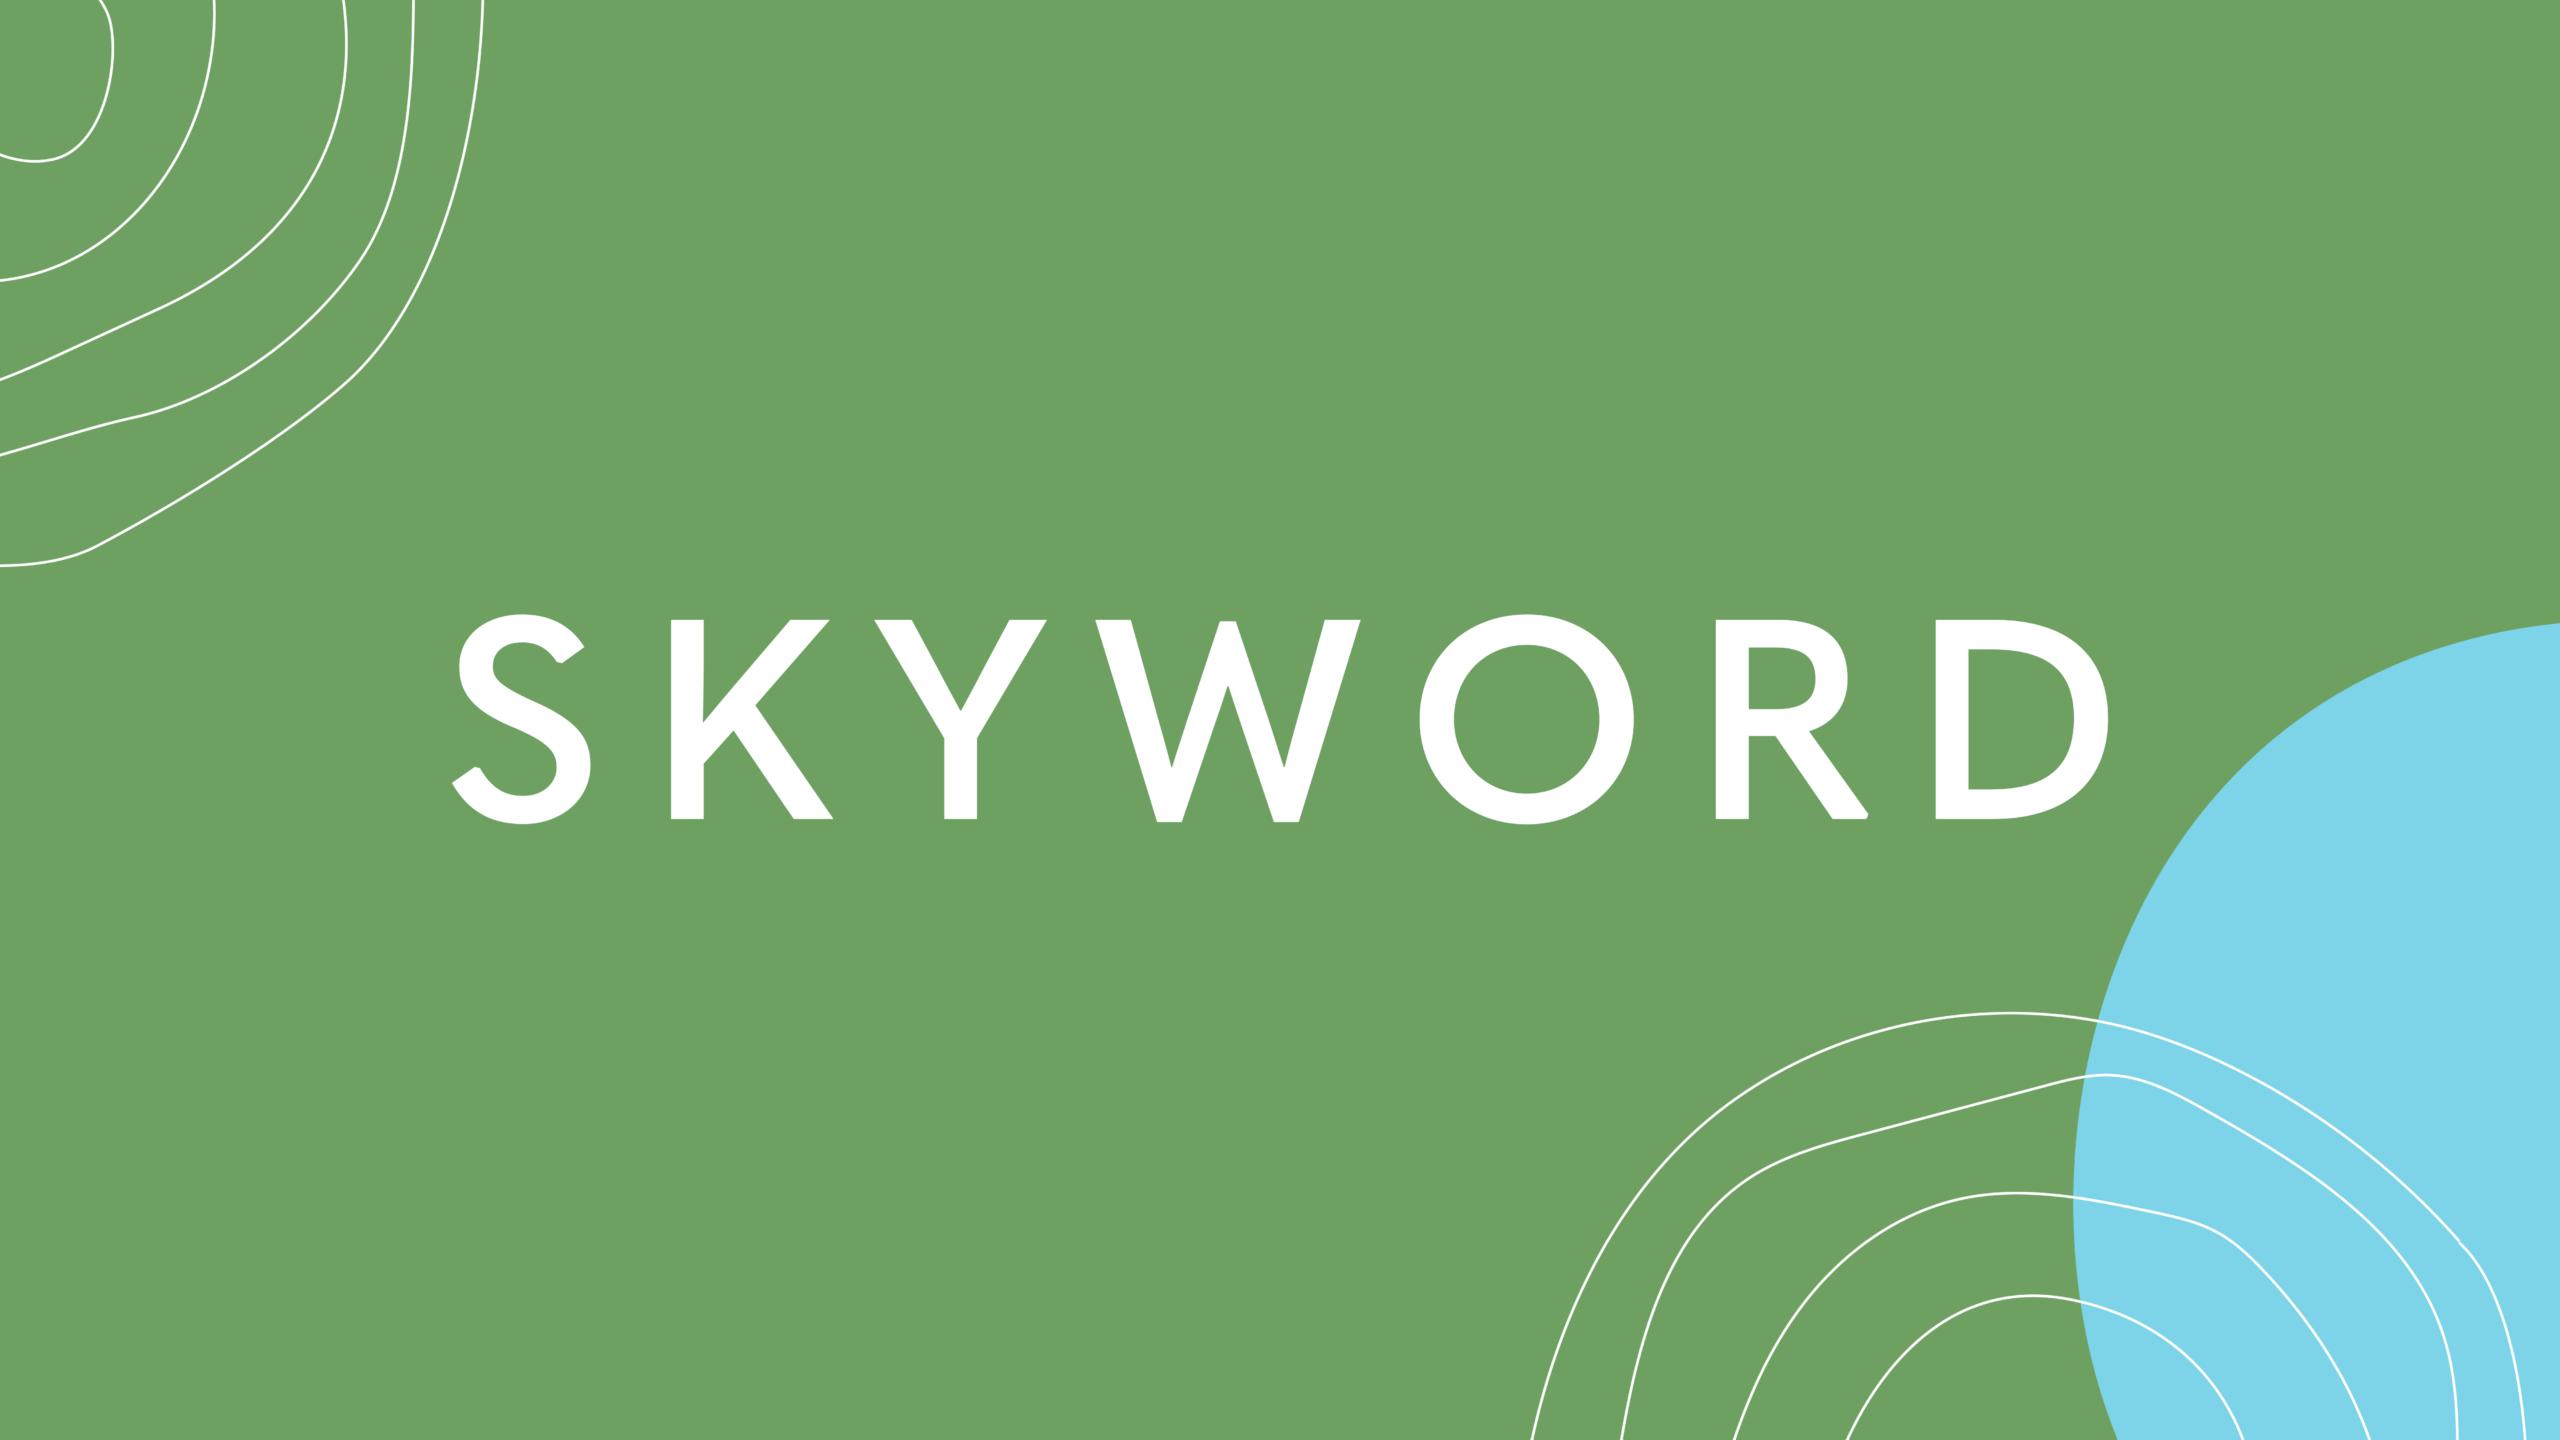 Skyword | The Content Marketing Company